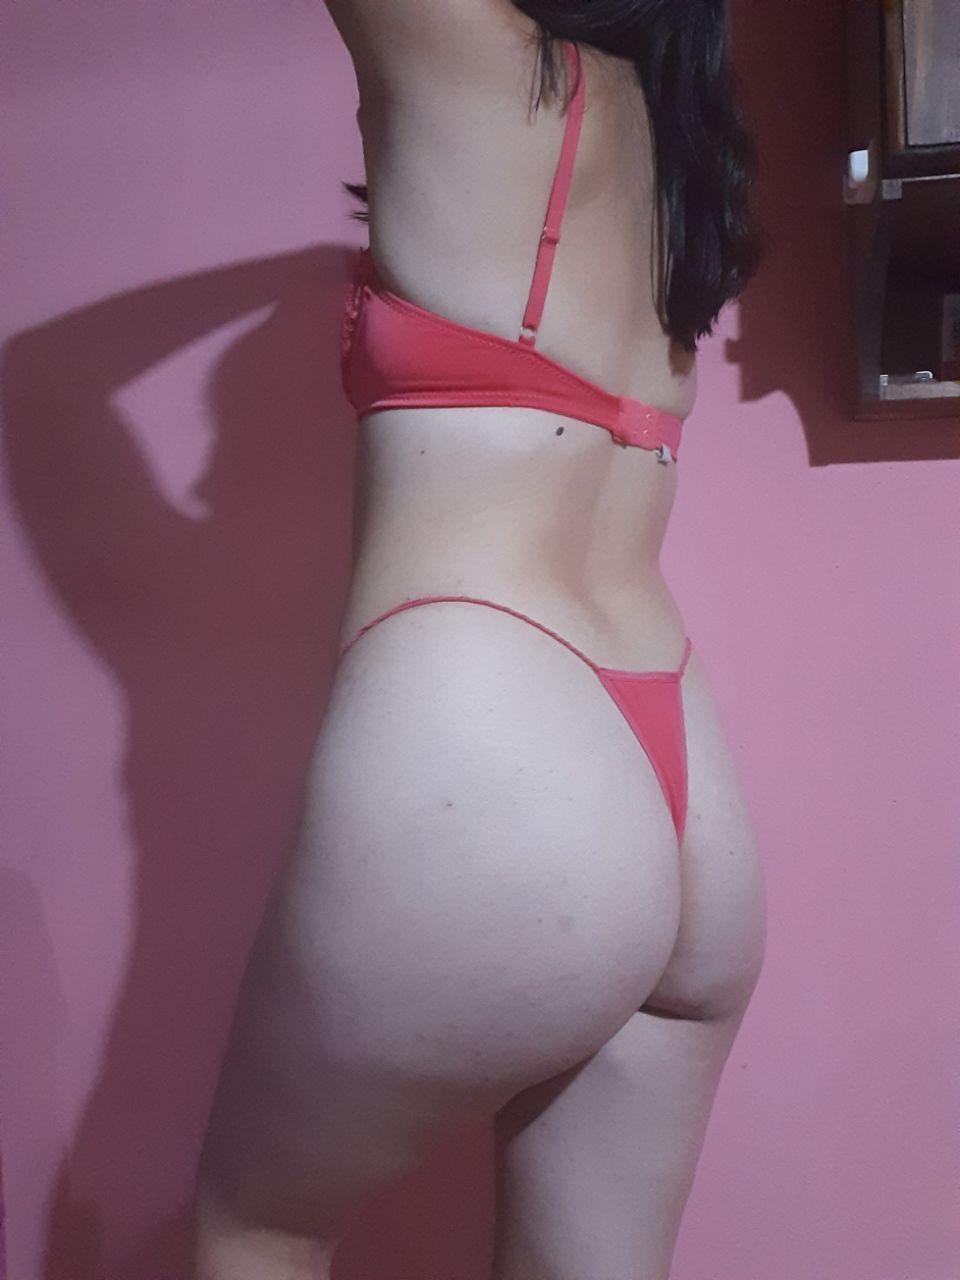 fotos de chicas amateurs xxx desnudas comentarios opiniones